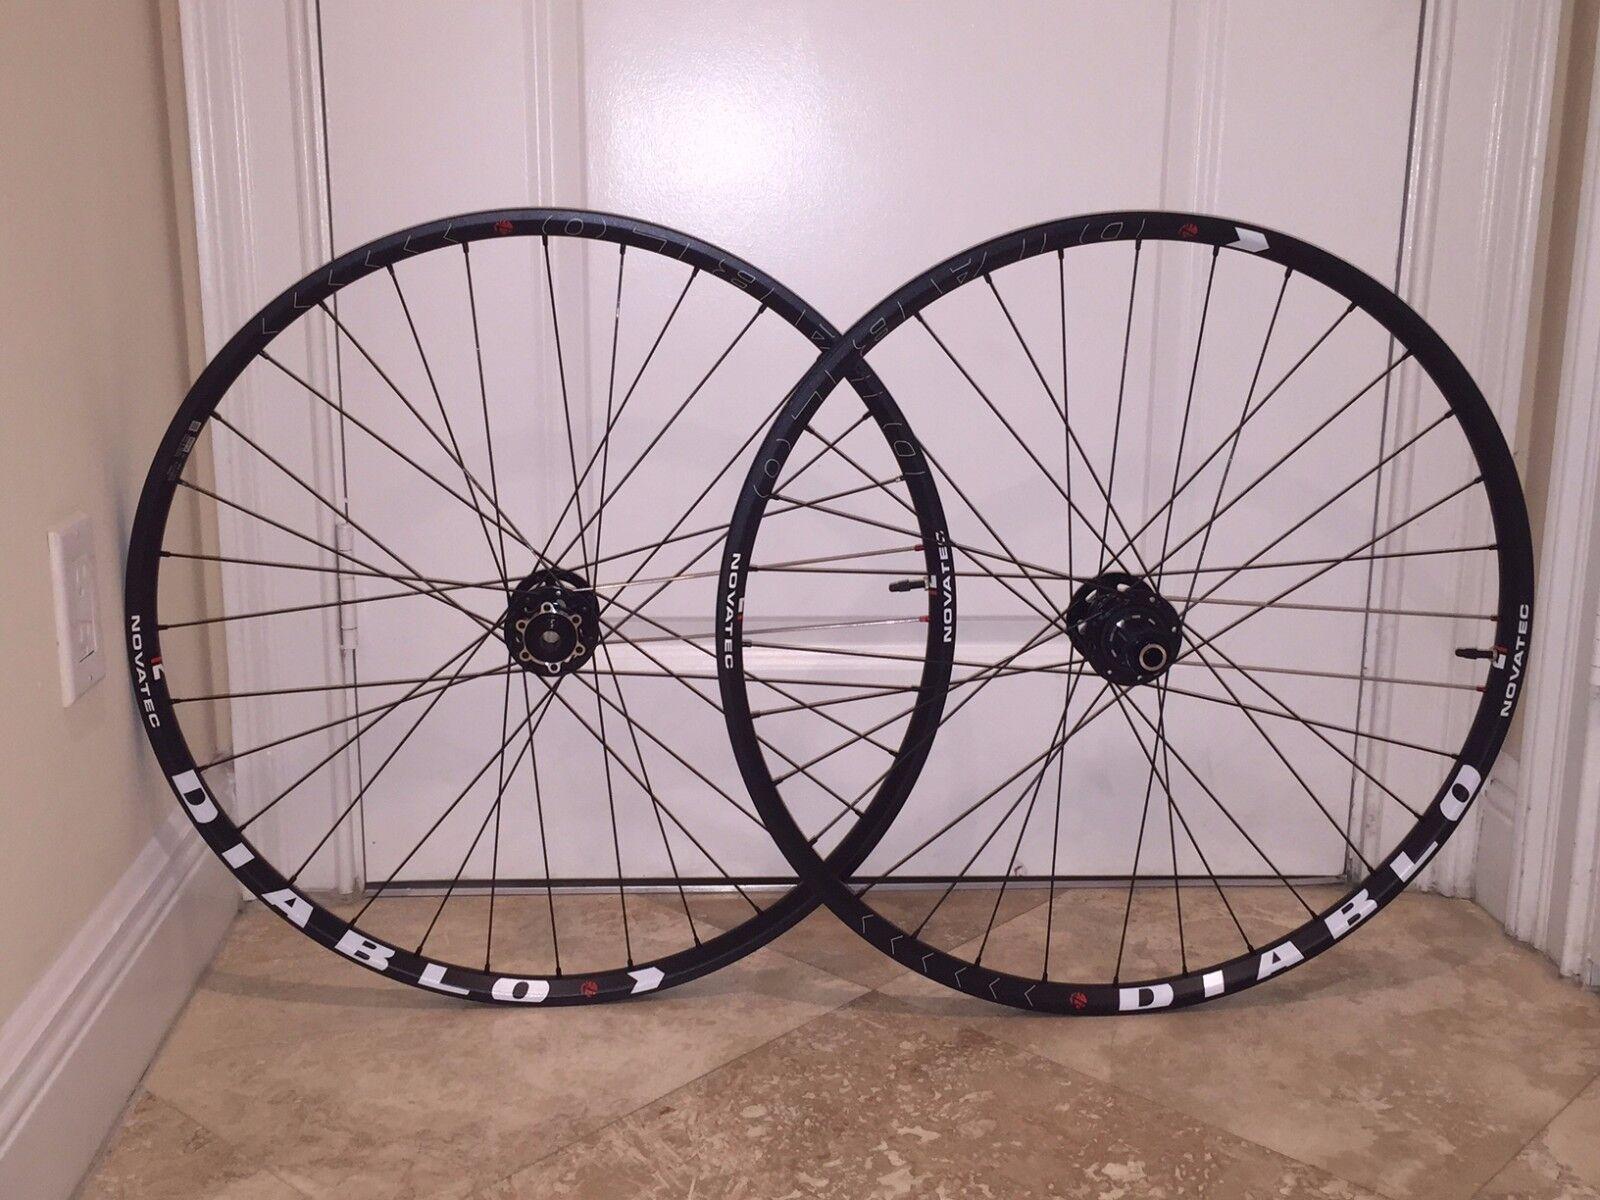 New Novatec  Diablo 27.5  Rim MTB Wheelset  save up to 50%